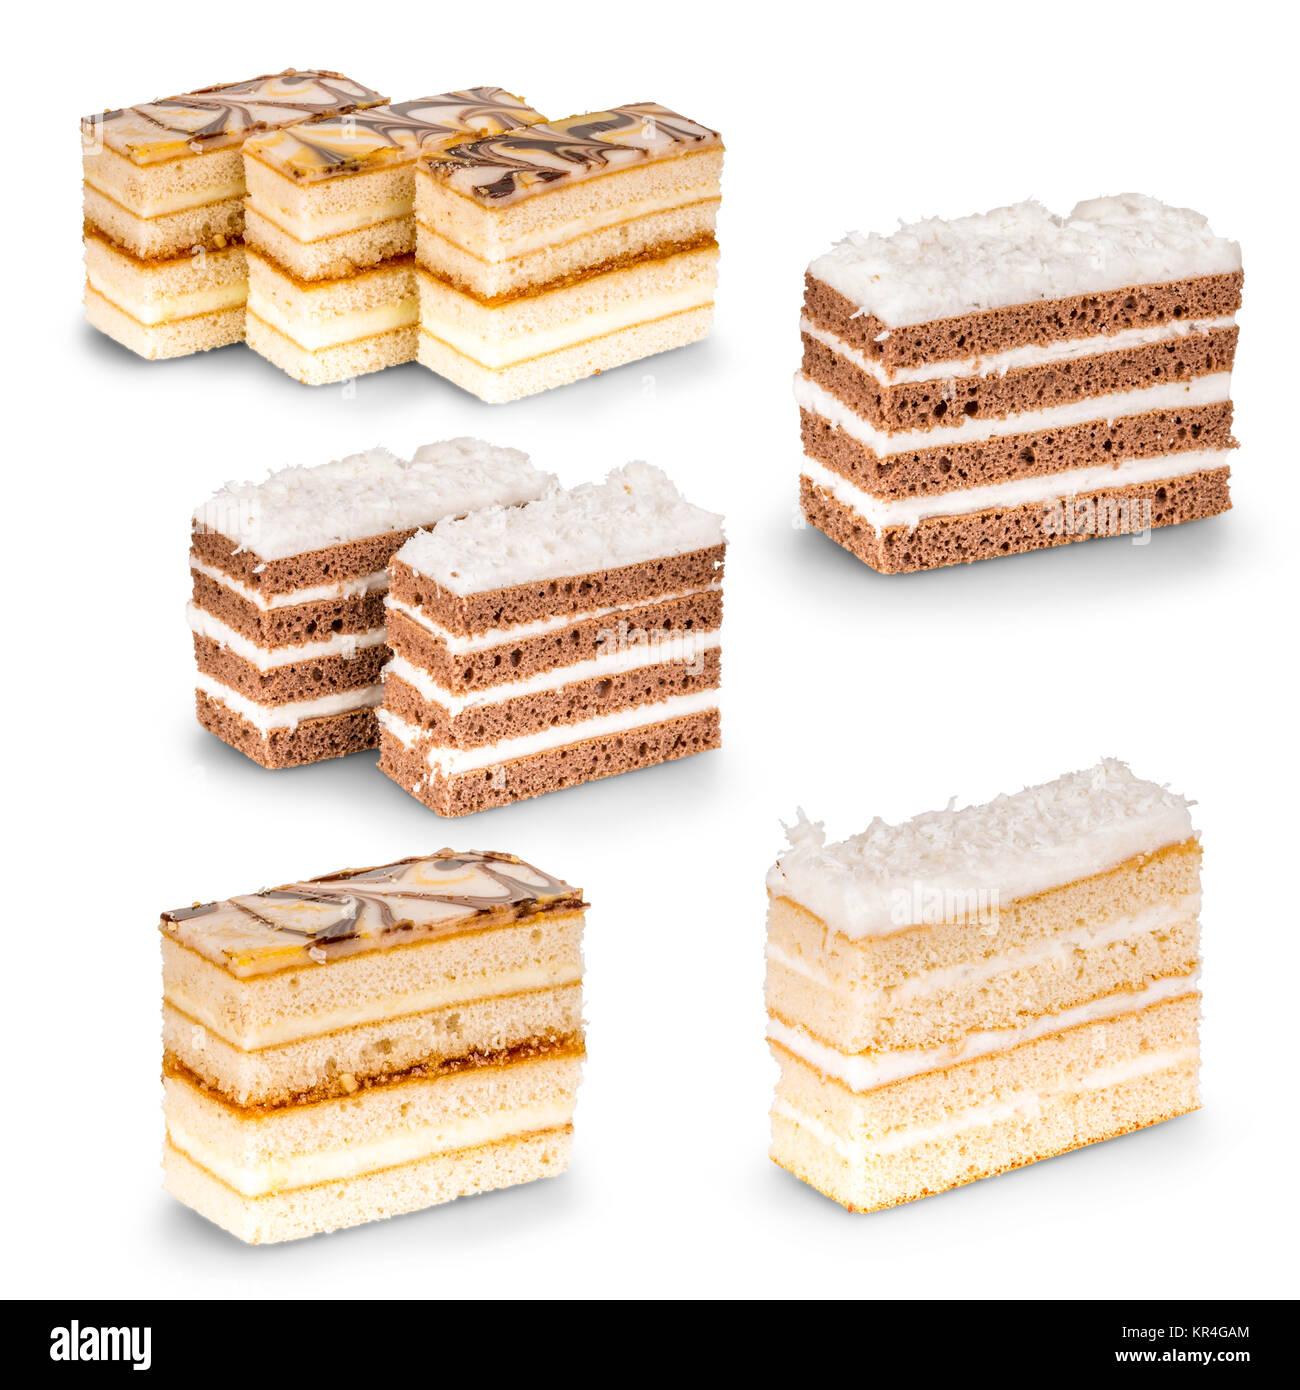 Various cake pieces - Stock Image